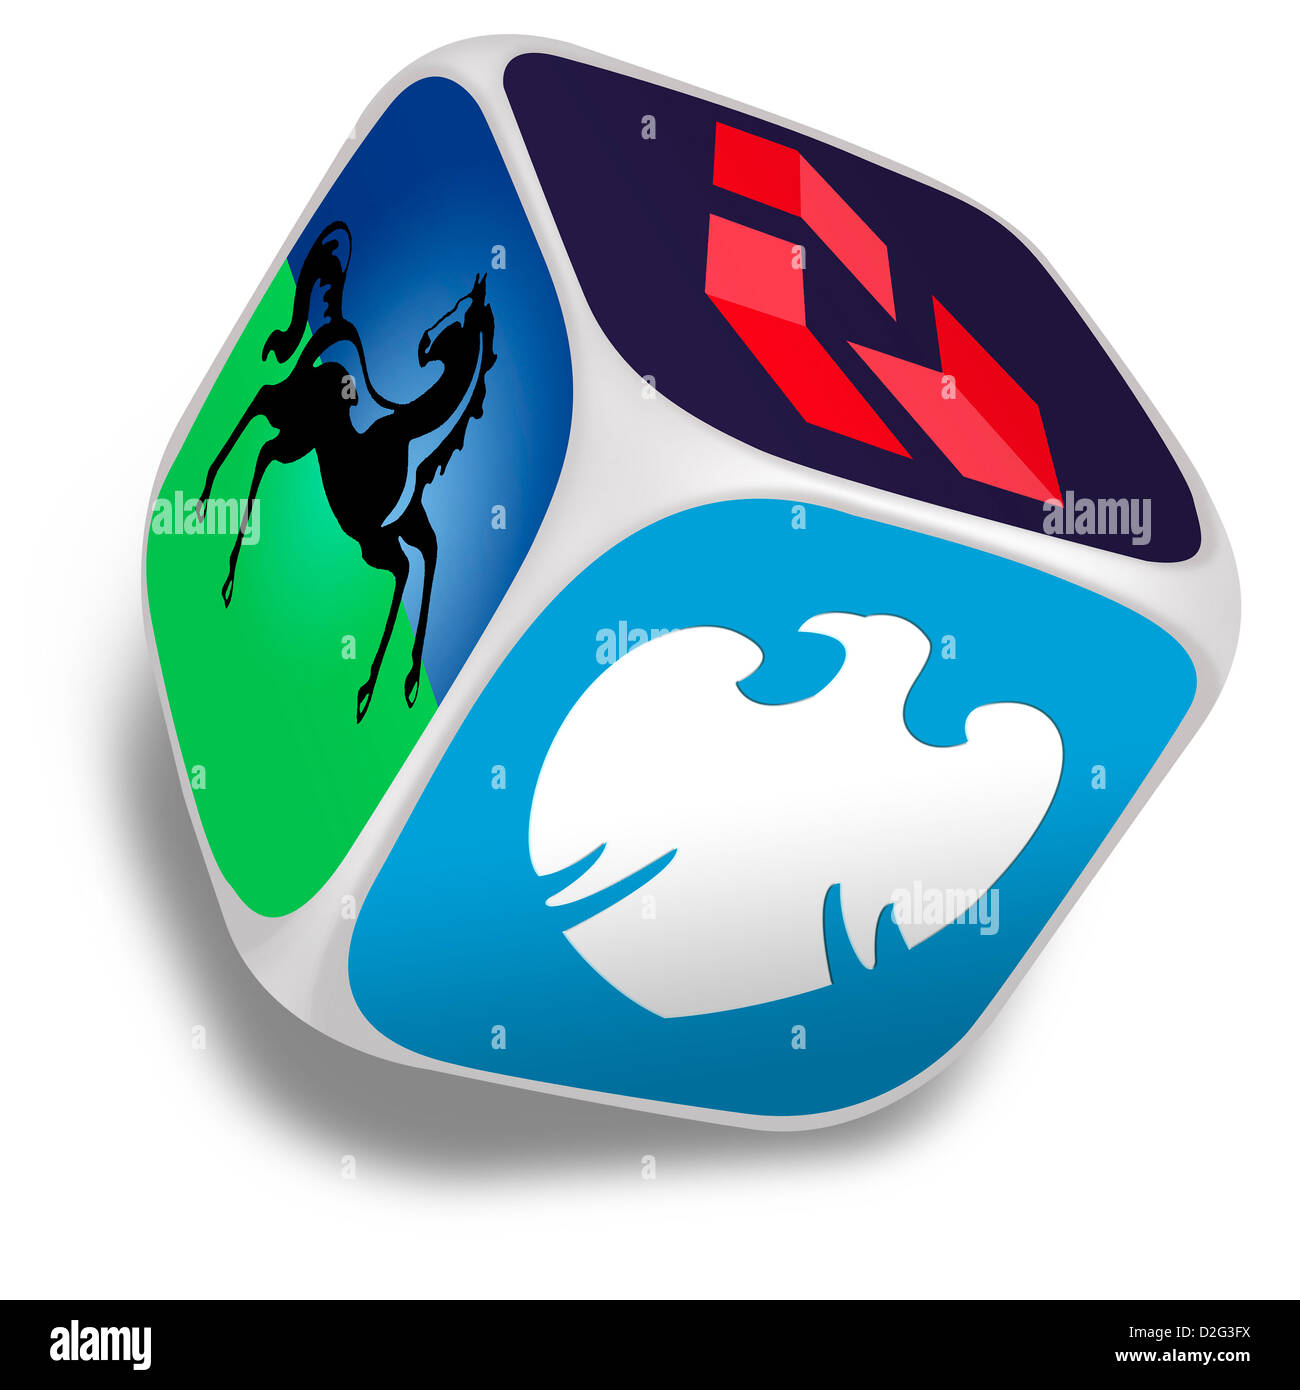 Uk Banks Logos Stock Photos & Uk Banks Logos Stock Images ...